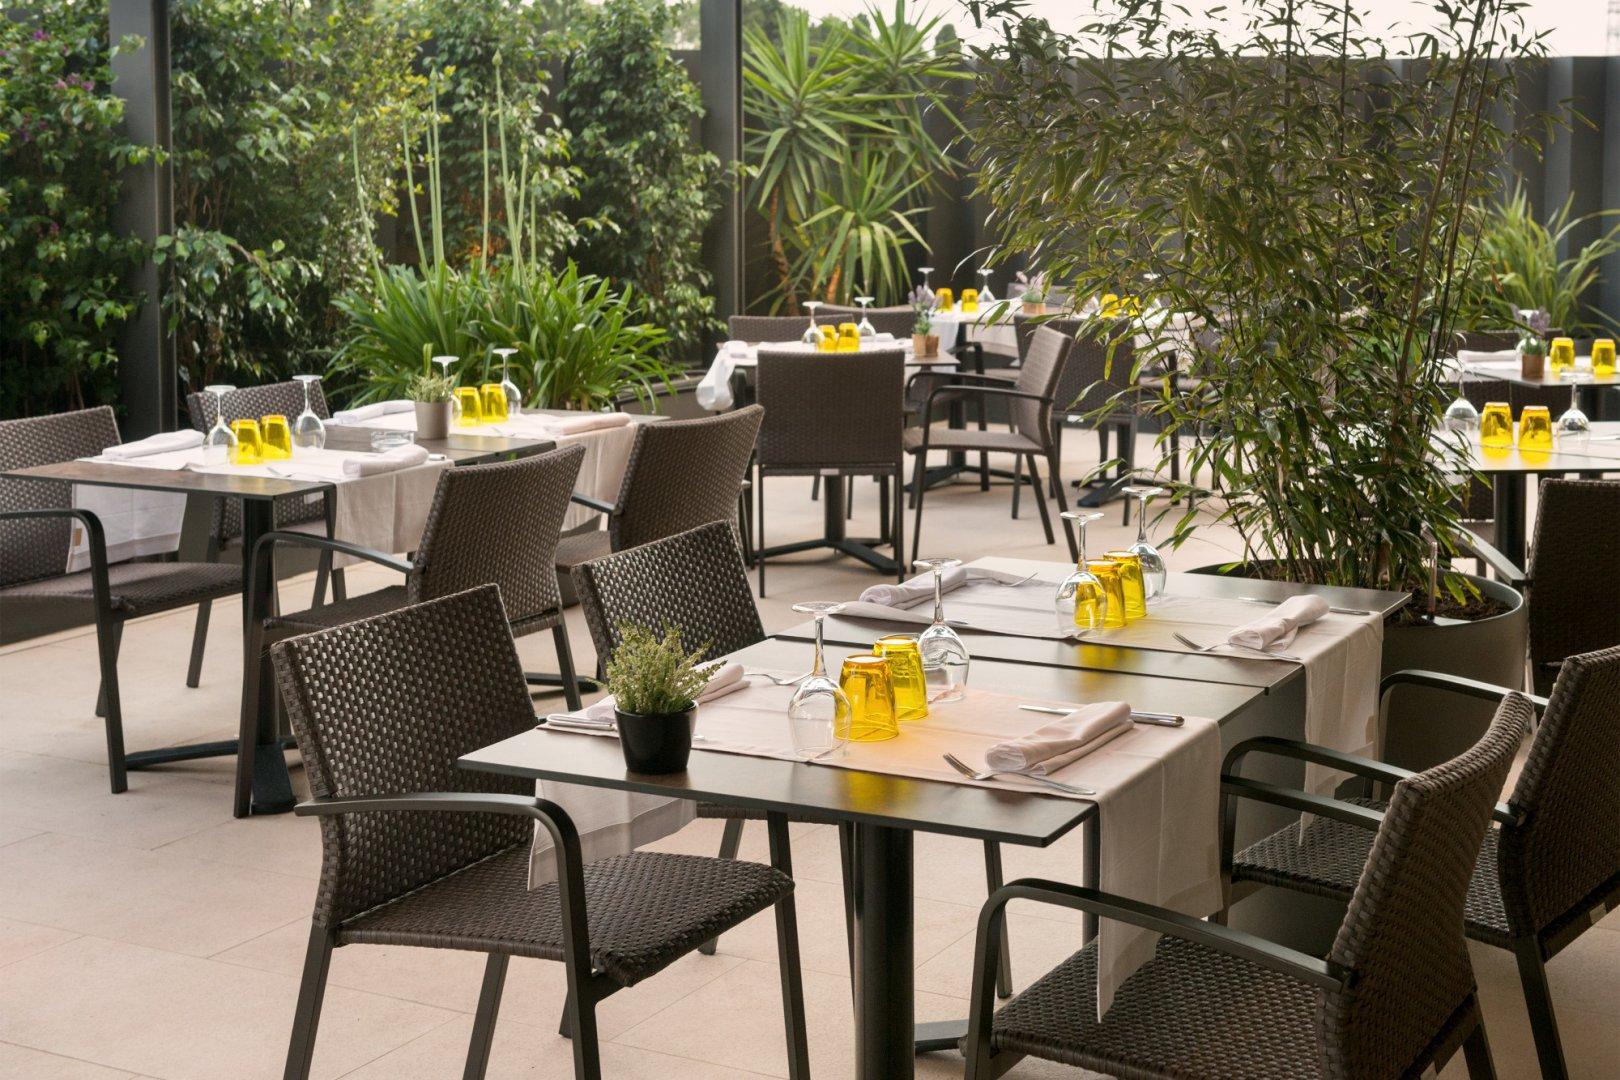 https://www.restaurantronda.com/imagecache/uploads_images_paginas_home_1620x1080_c_dsc-7983-copia.jpg